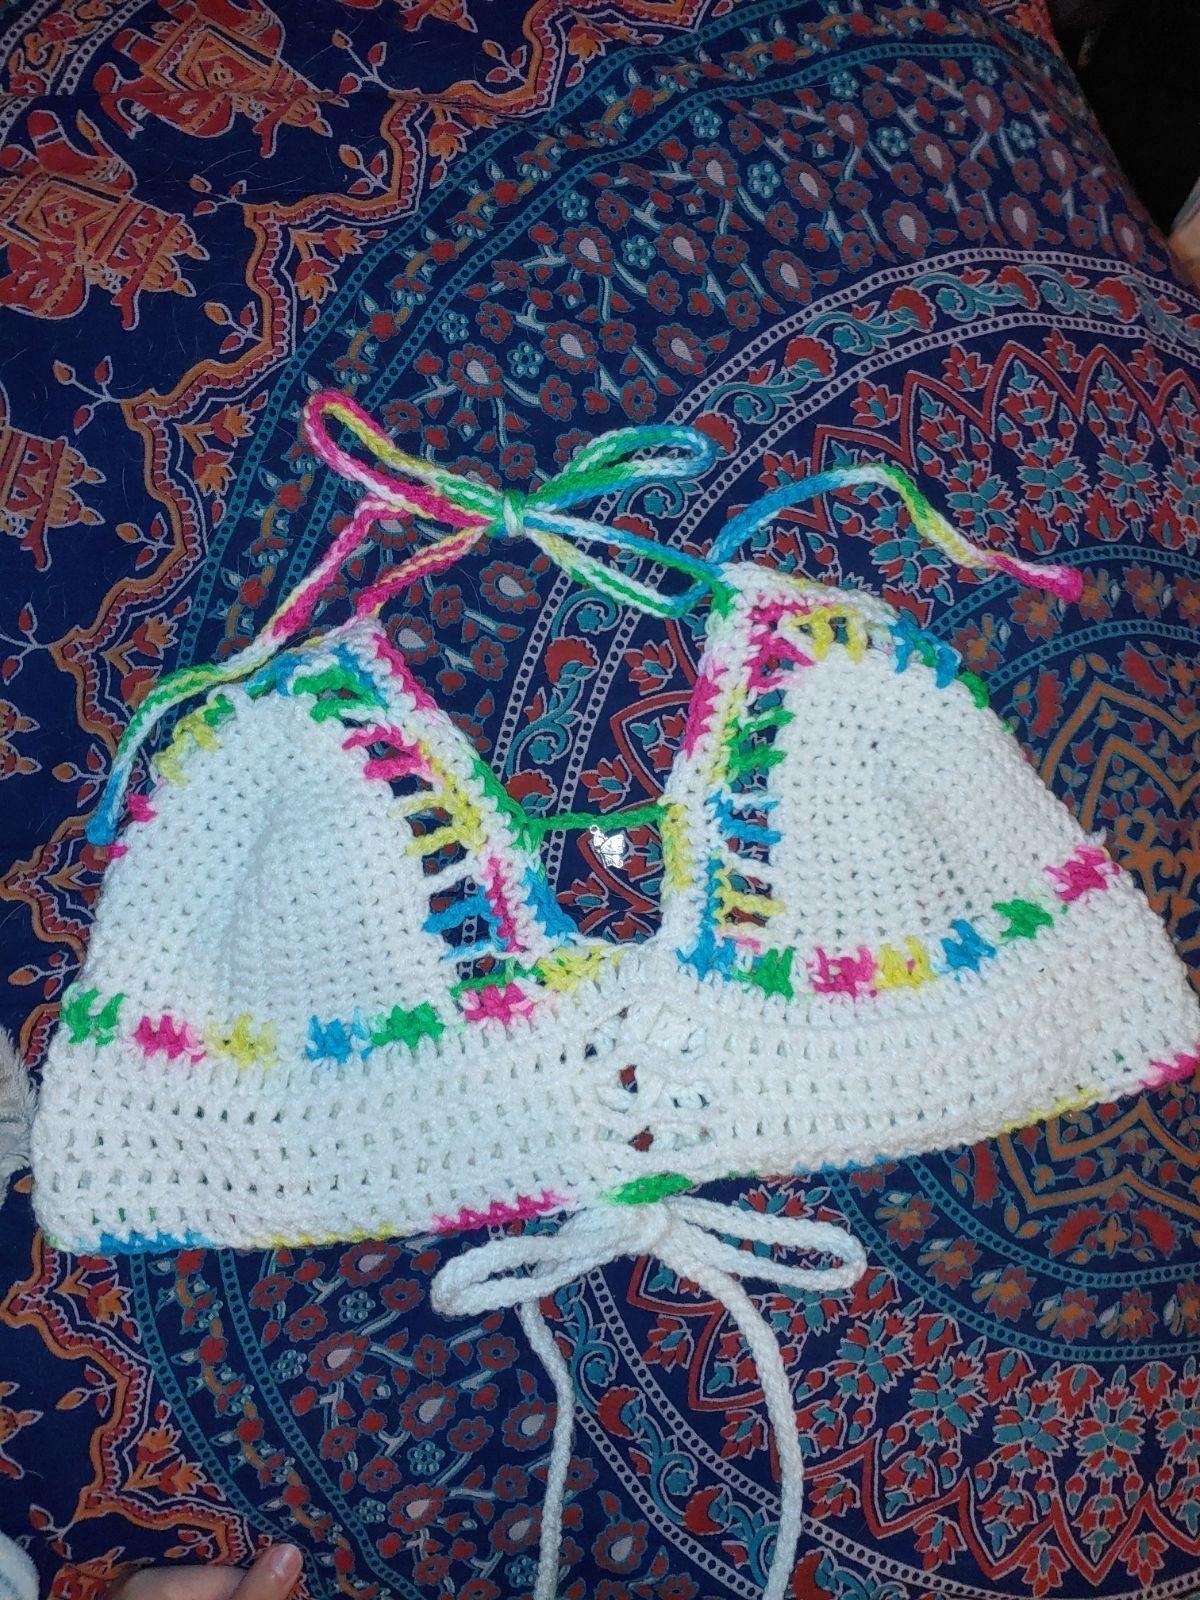 Charmed Crochet Top